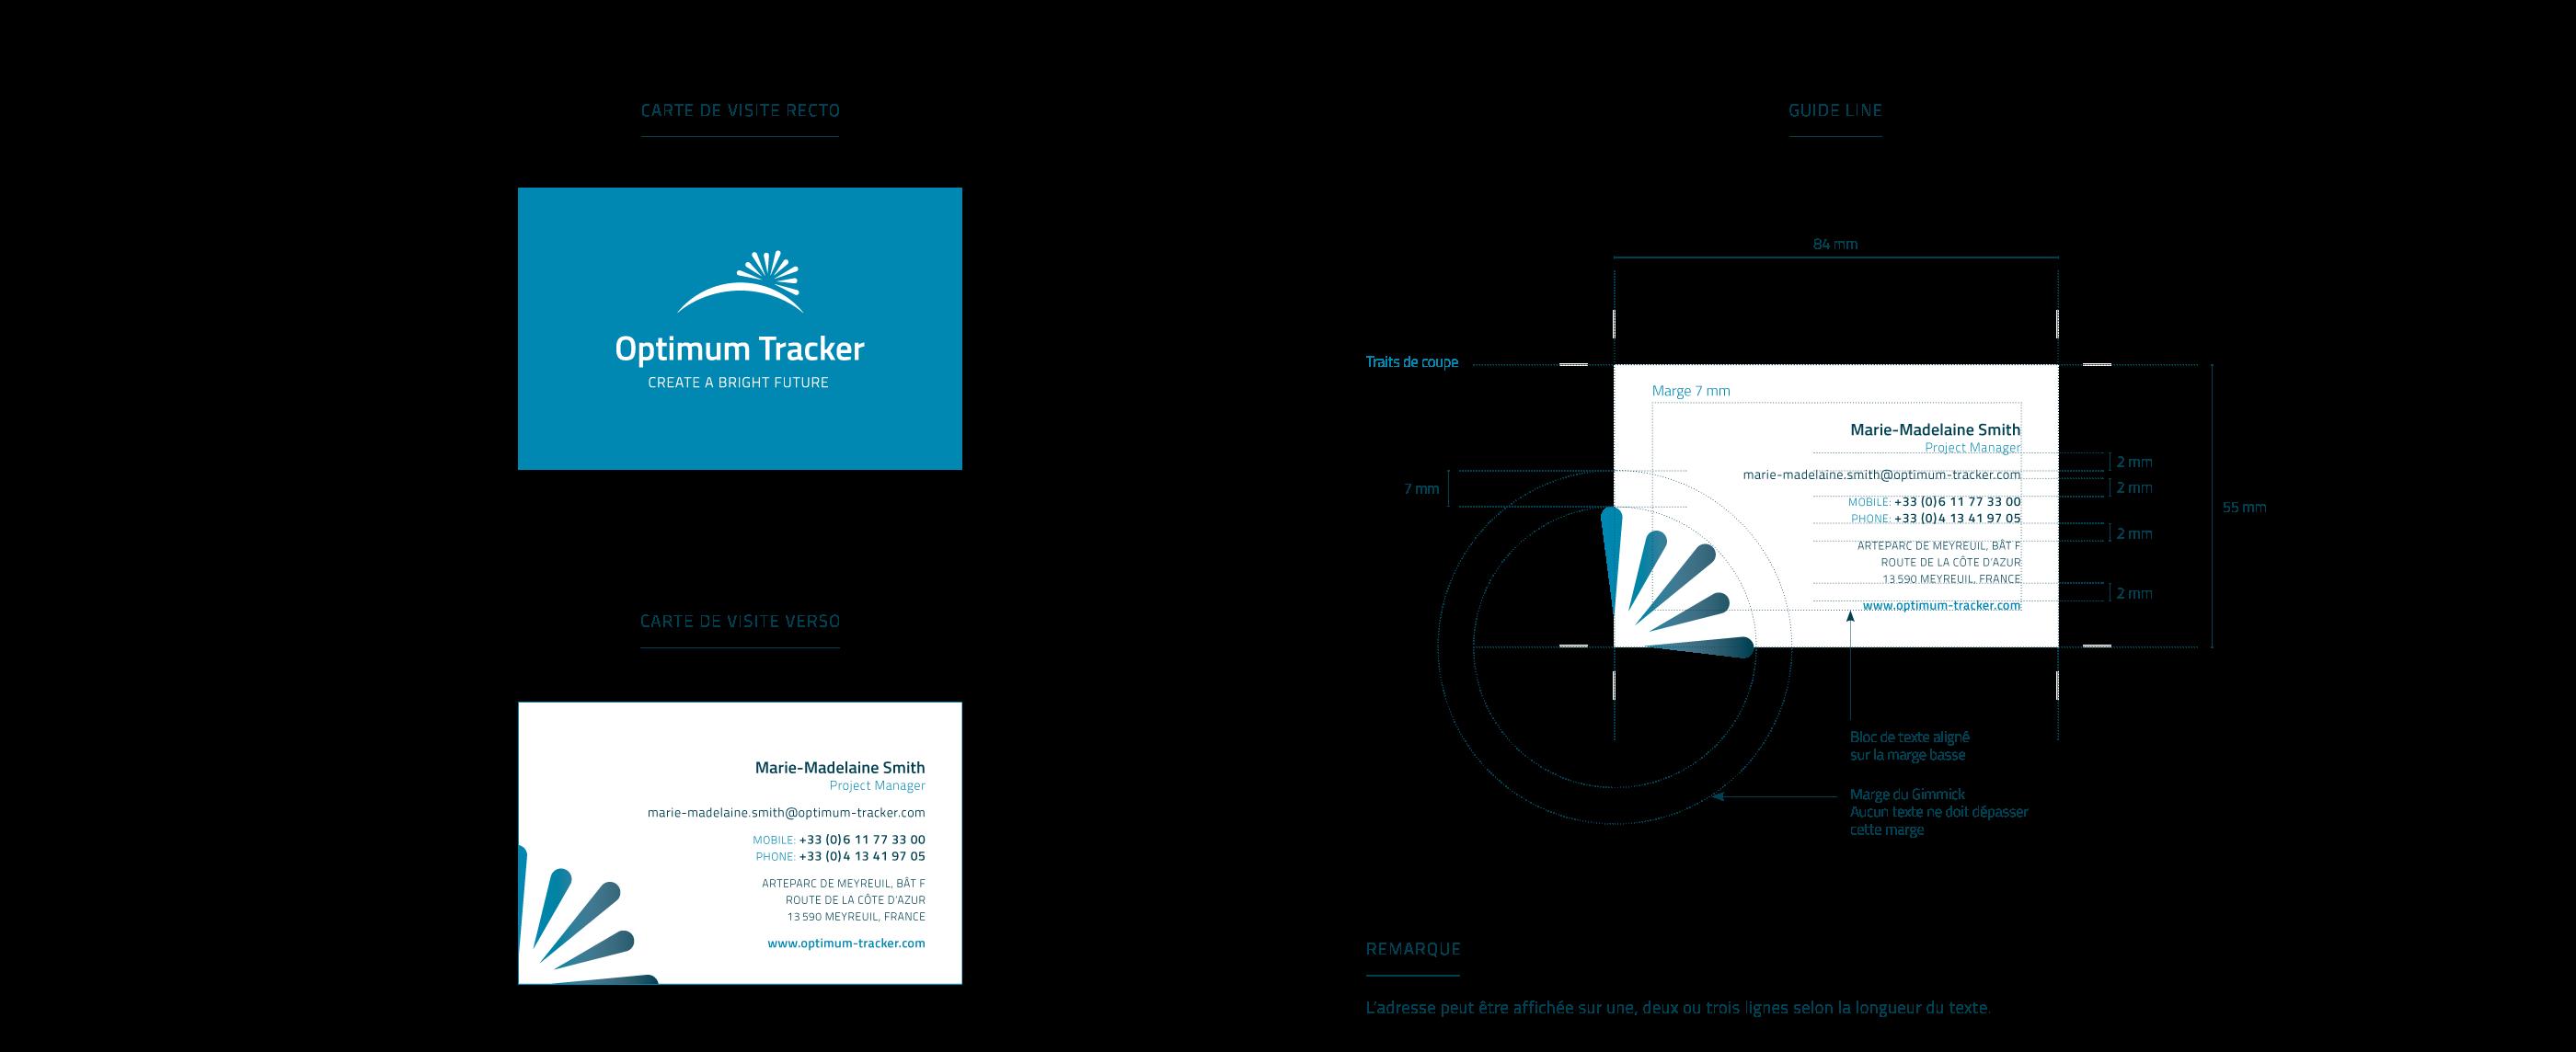 Carte Optimum.Optimum Tracker Raphael Wittmann